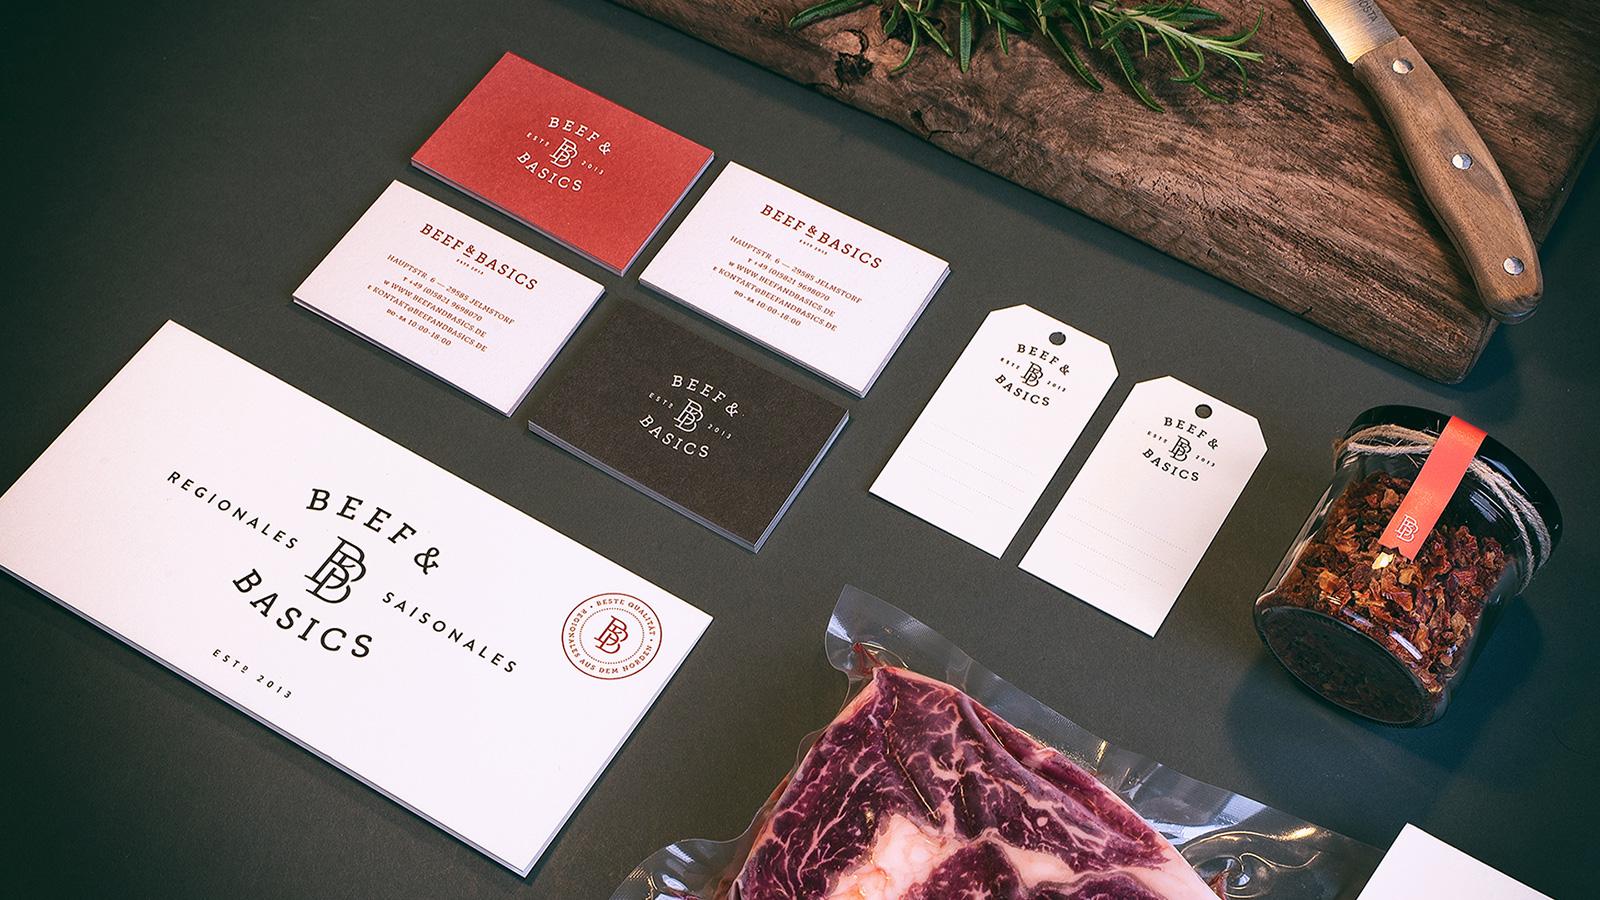 mscholz-beef-and-basics-01